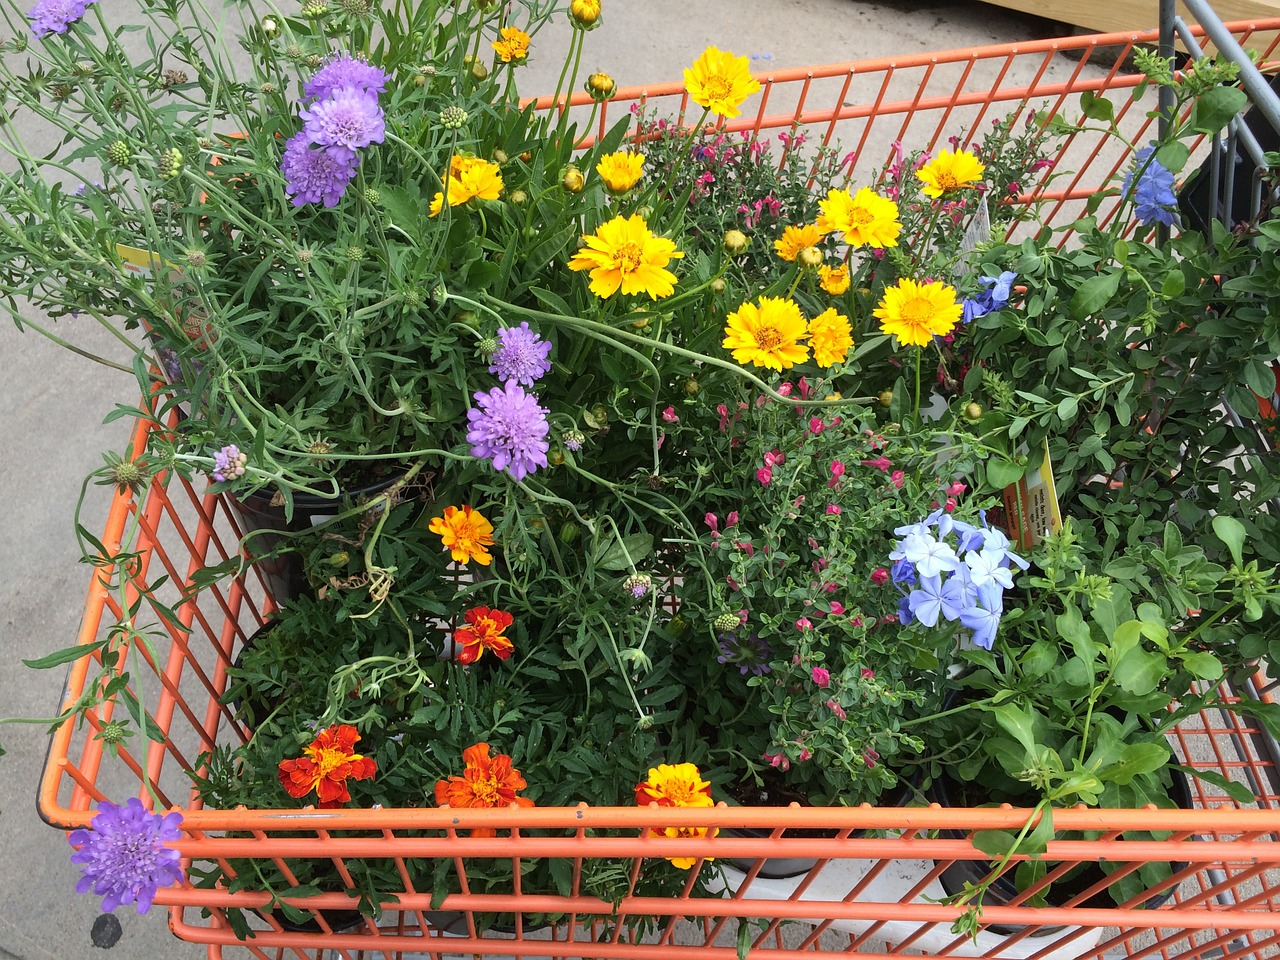 Wo kauft man Balkonpflanzen?